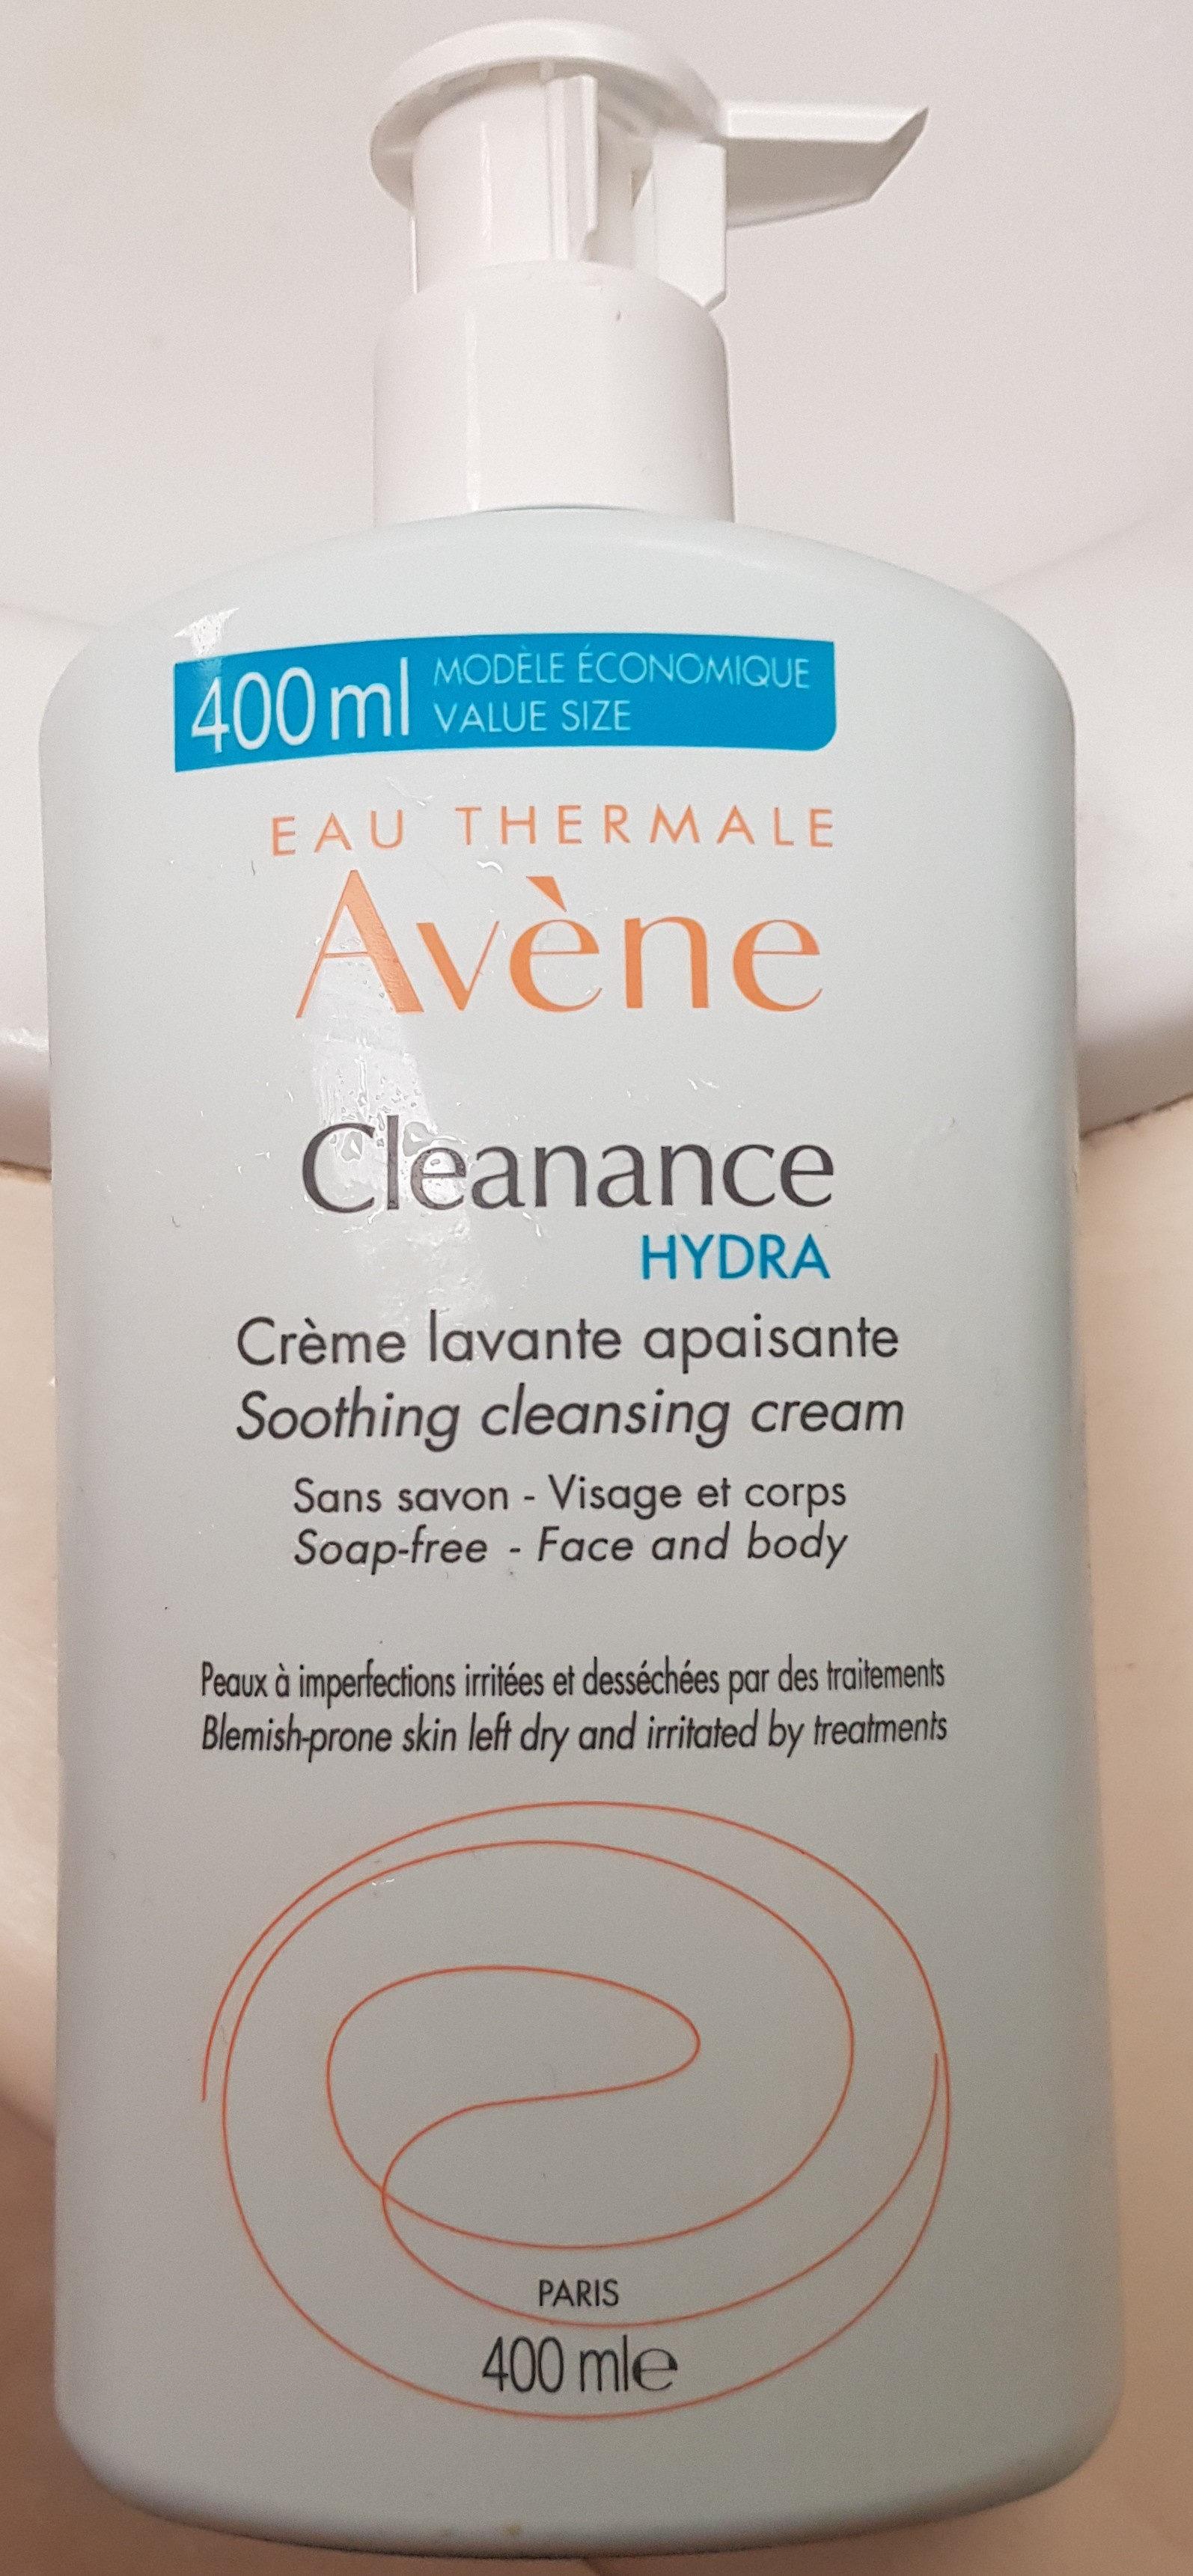 Cleanance hydra - Produit - fr